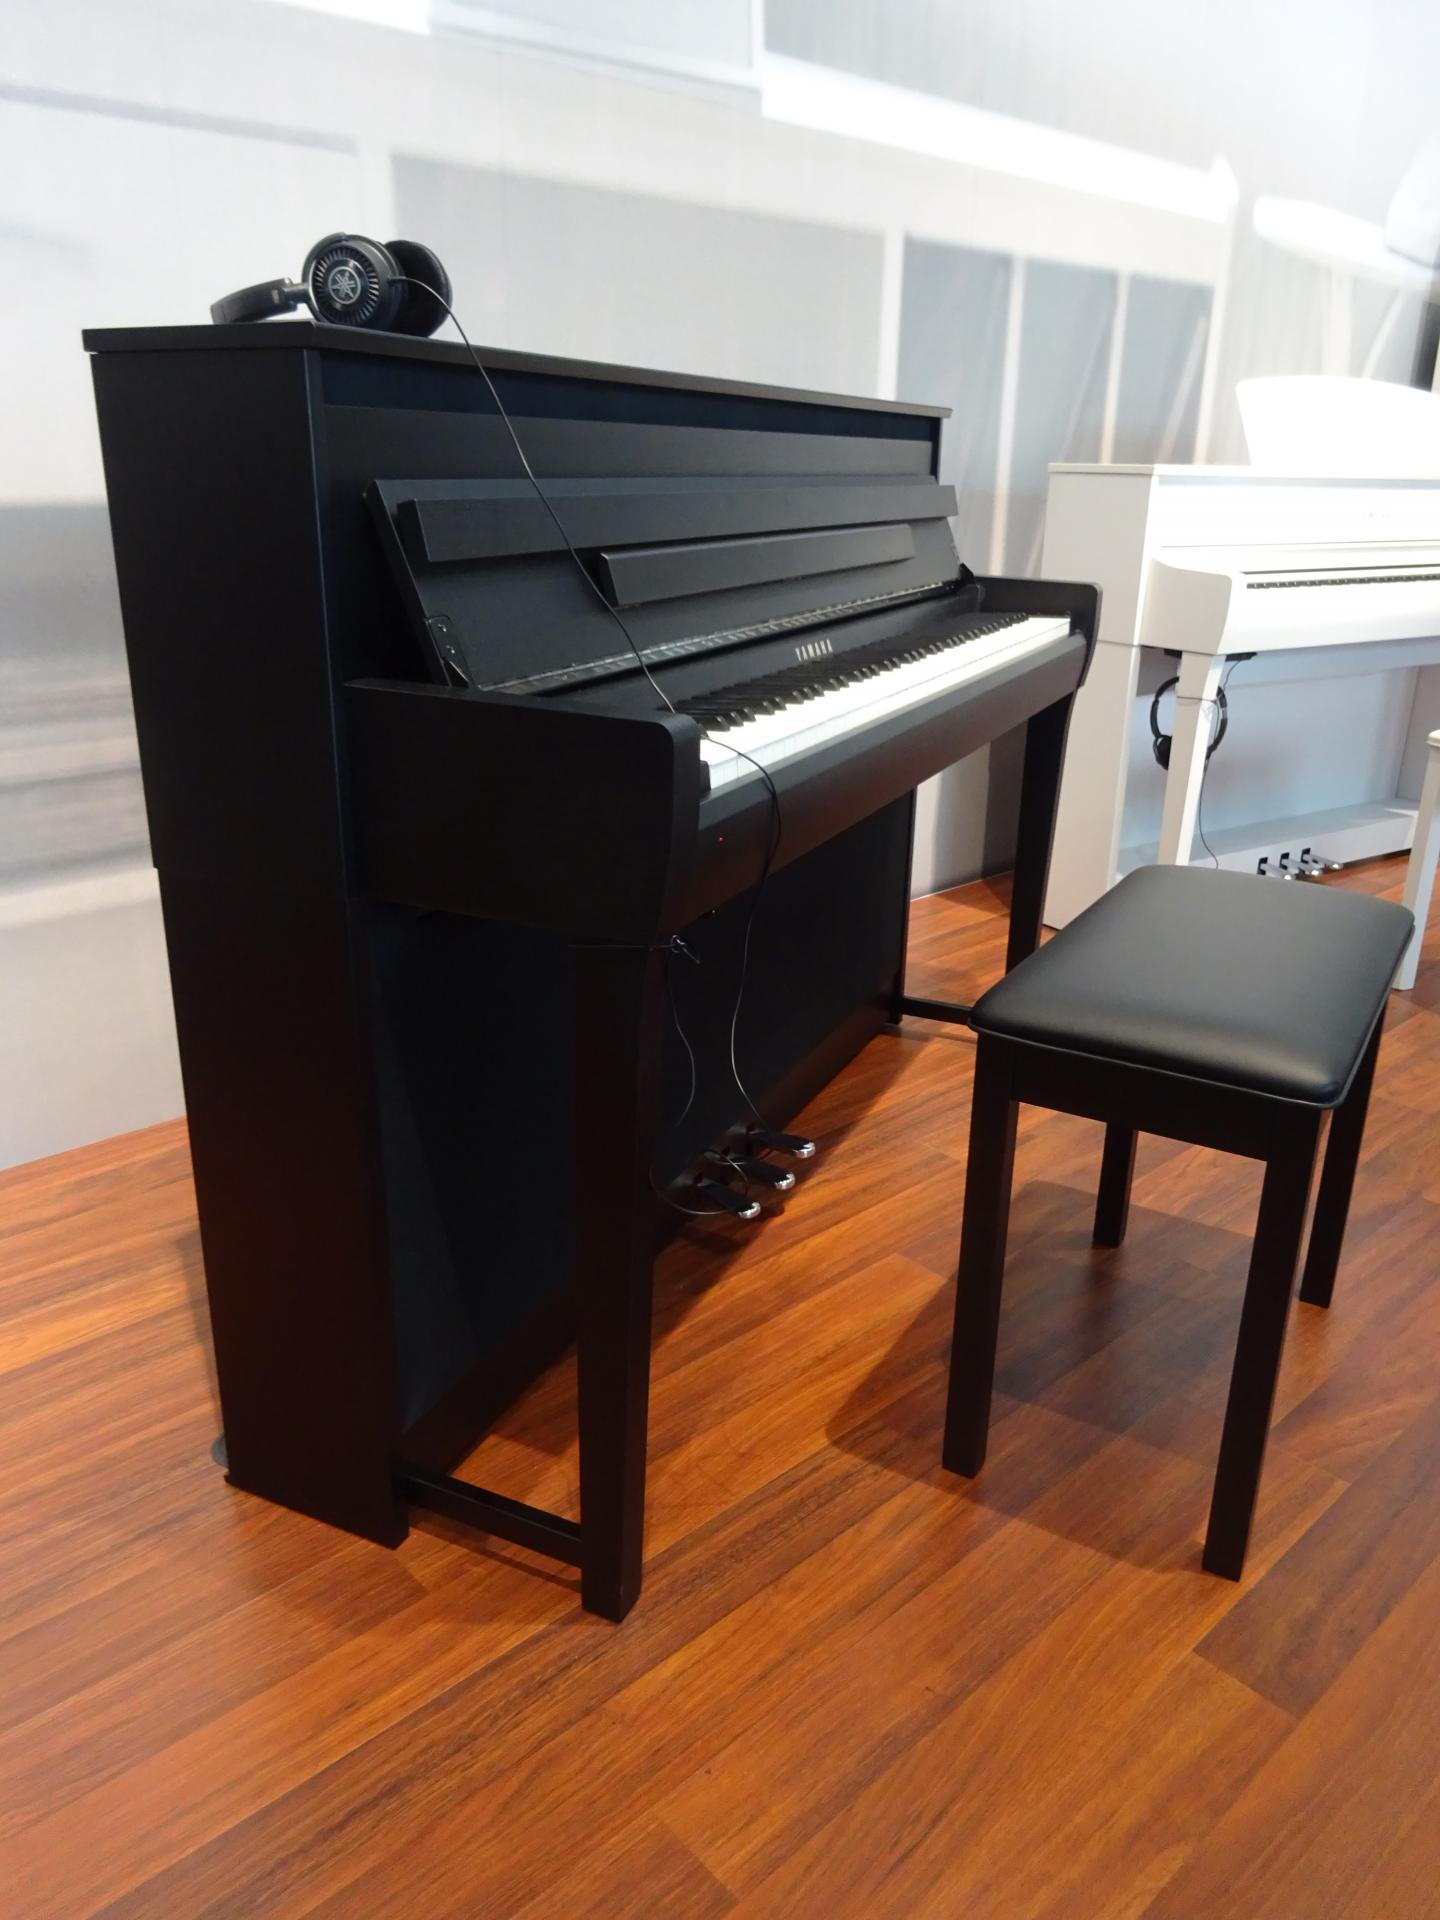 yamaha clp685b finition noir mat. Black Bedroom Furniture Sets. Home Design Ideas